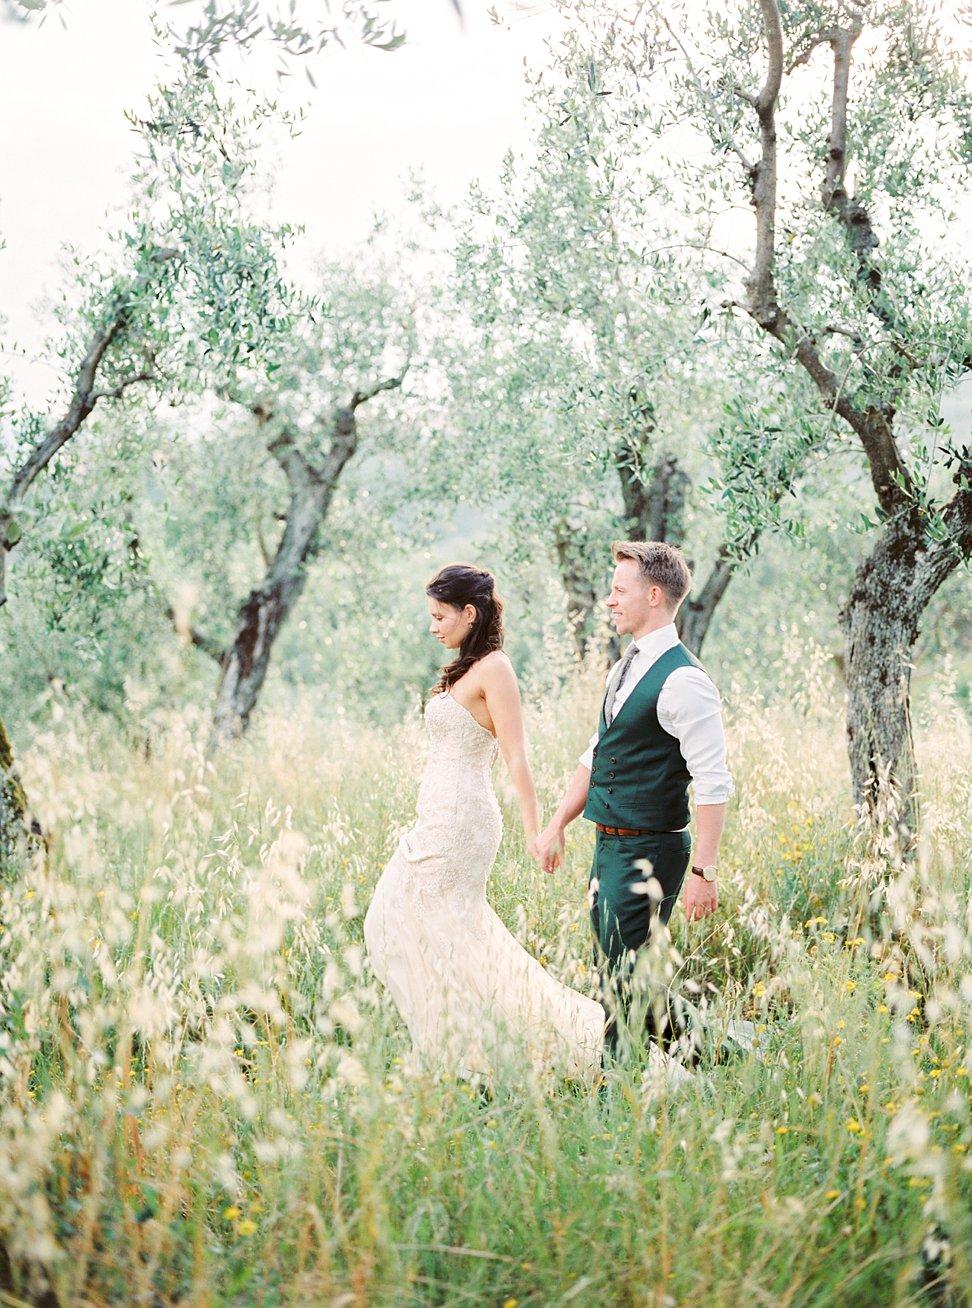 Amanda-Drost-photography-wedding-italy-Villa-sermolli-tuscany_0031.jpg